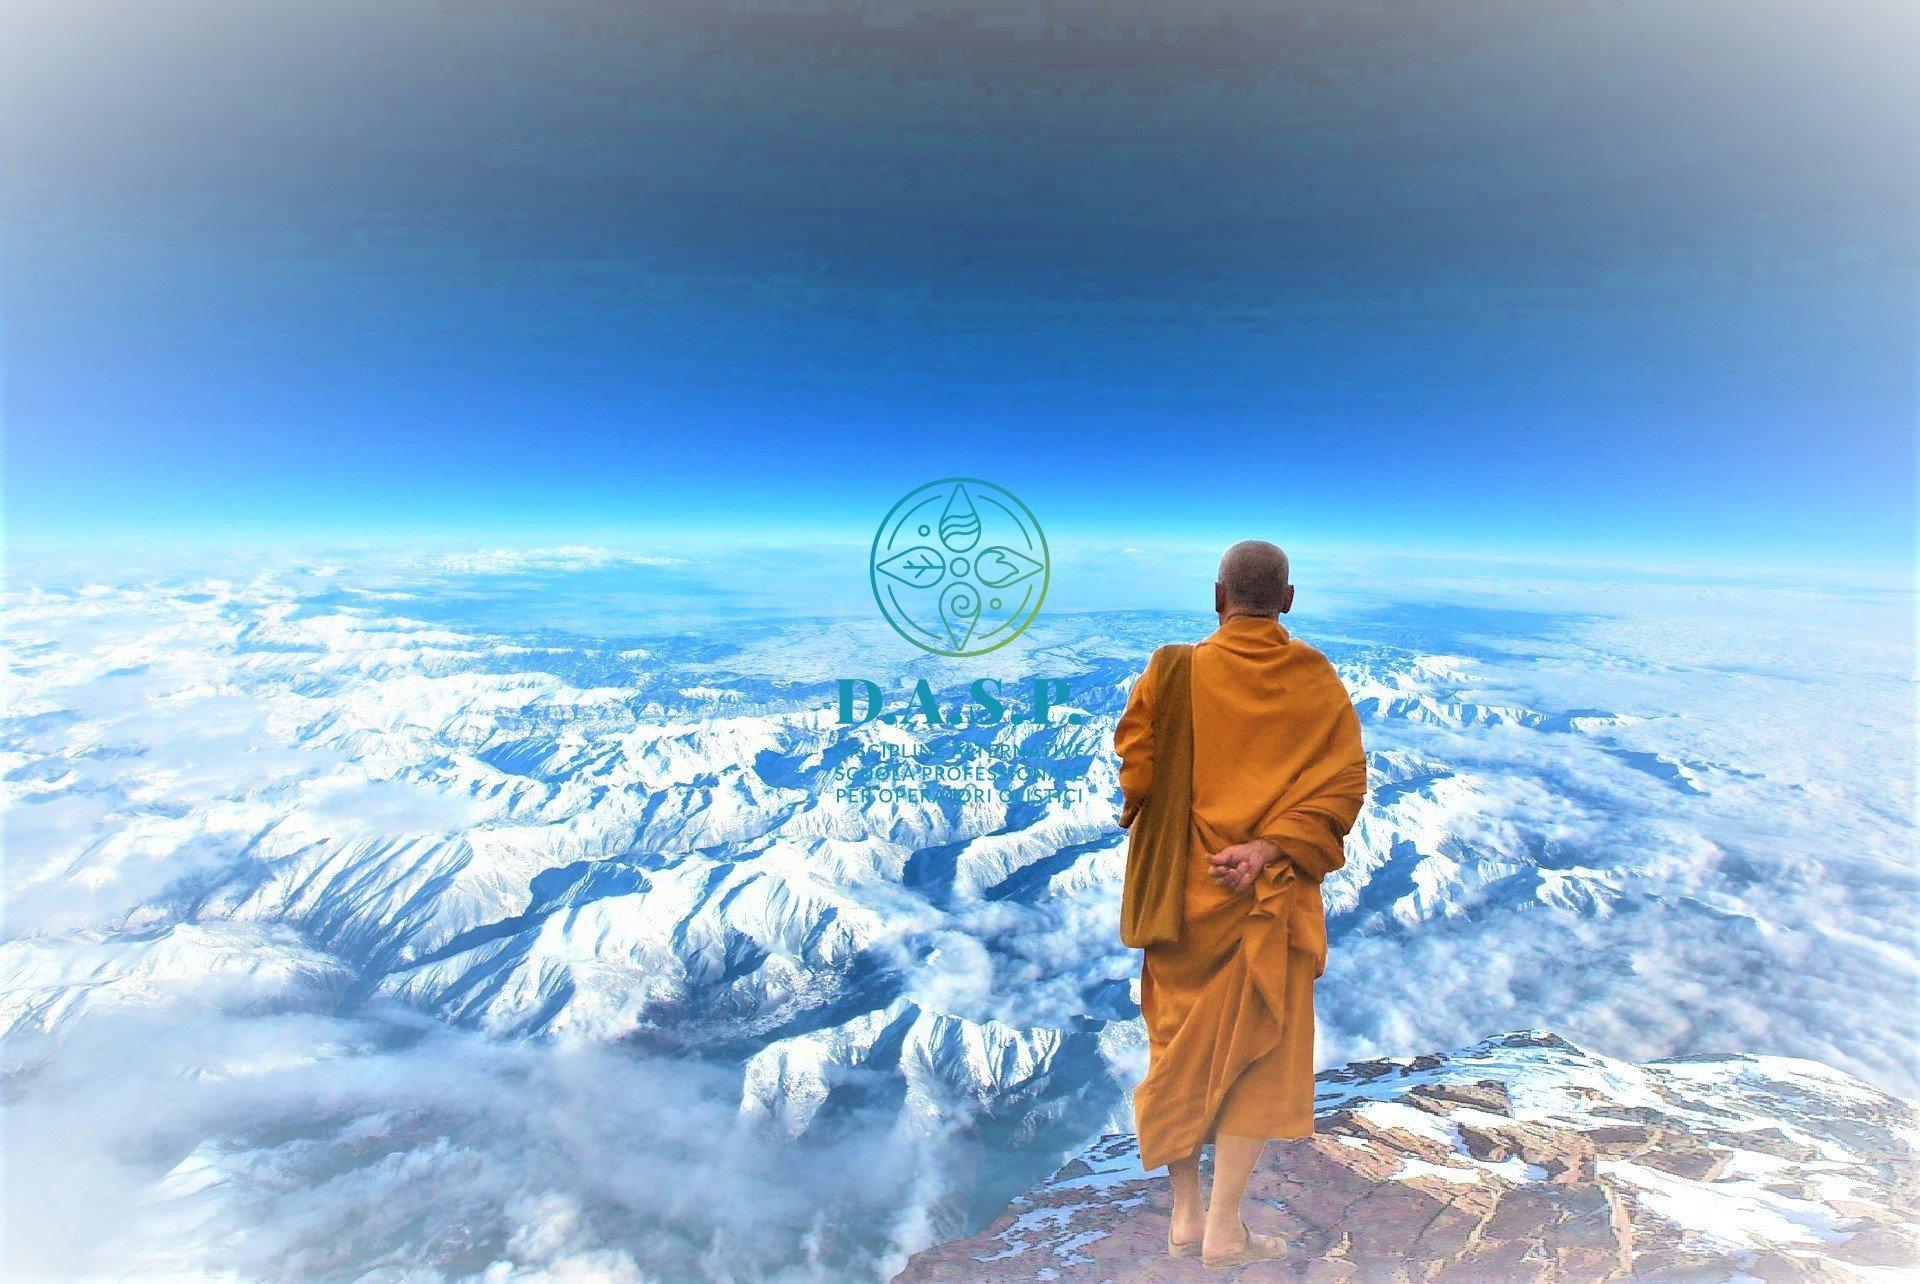 buddhist-737274_1920 (2)